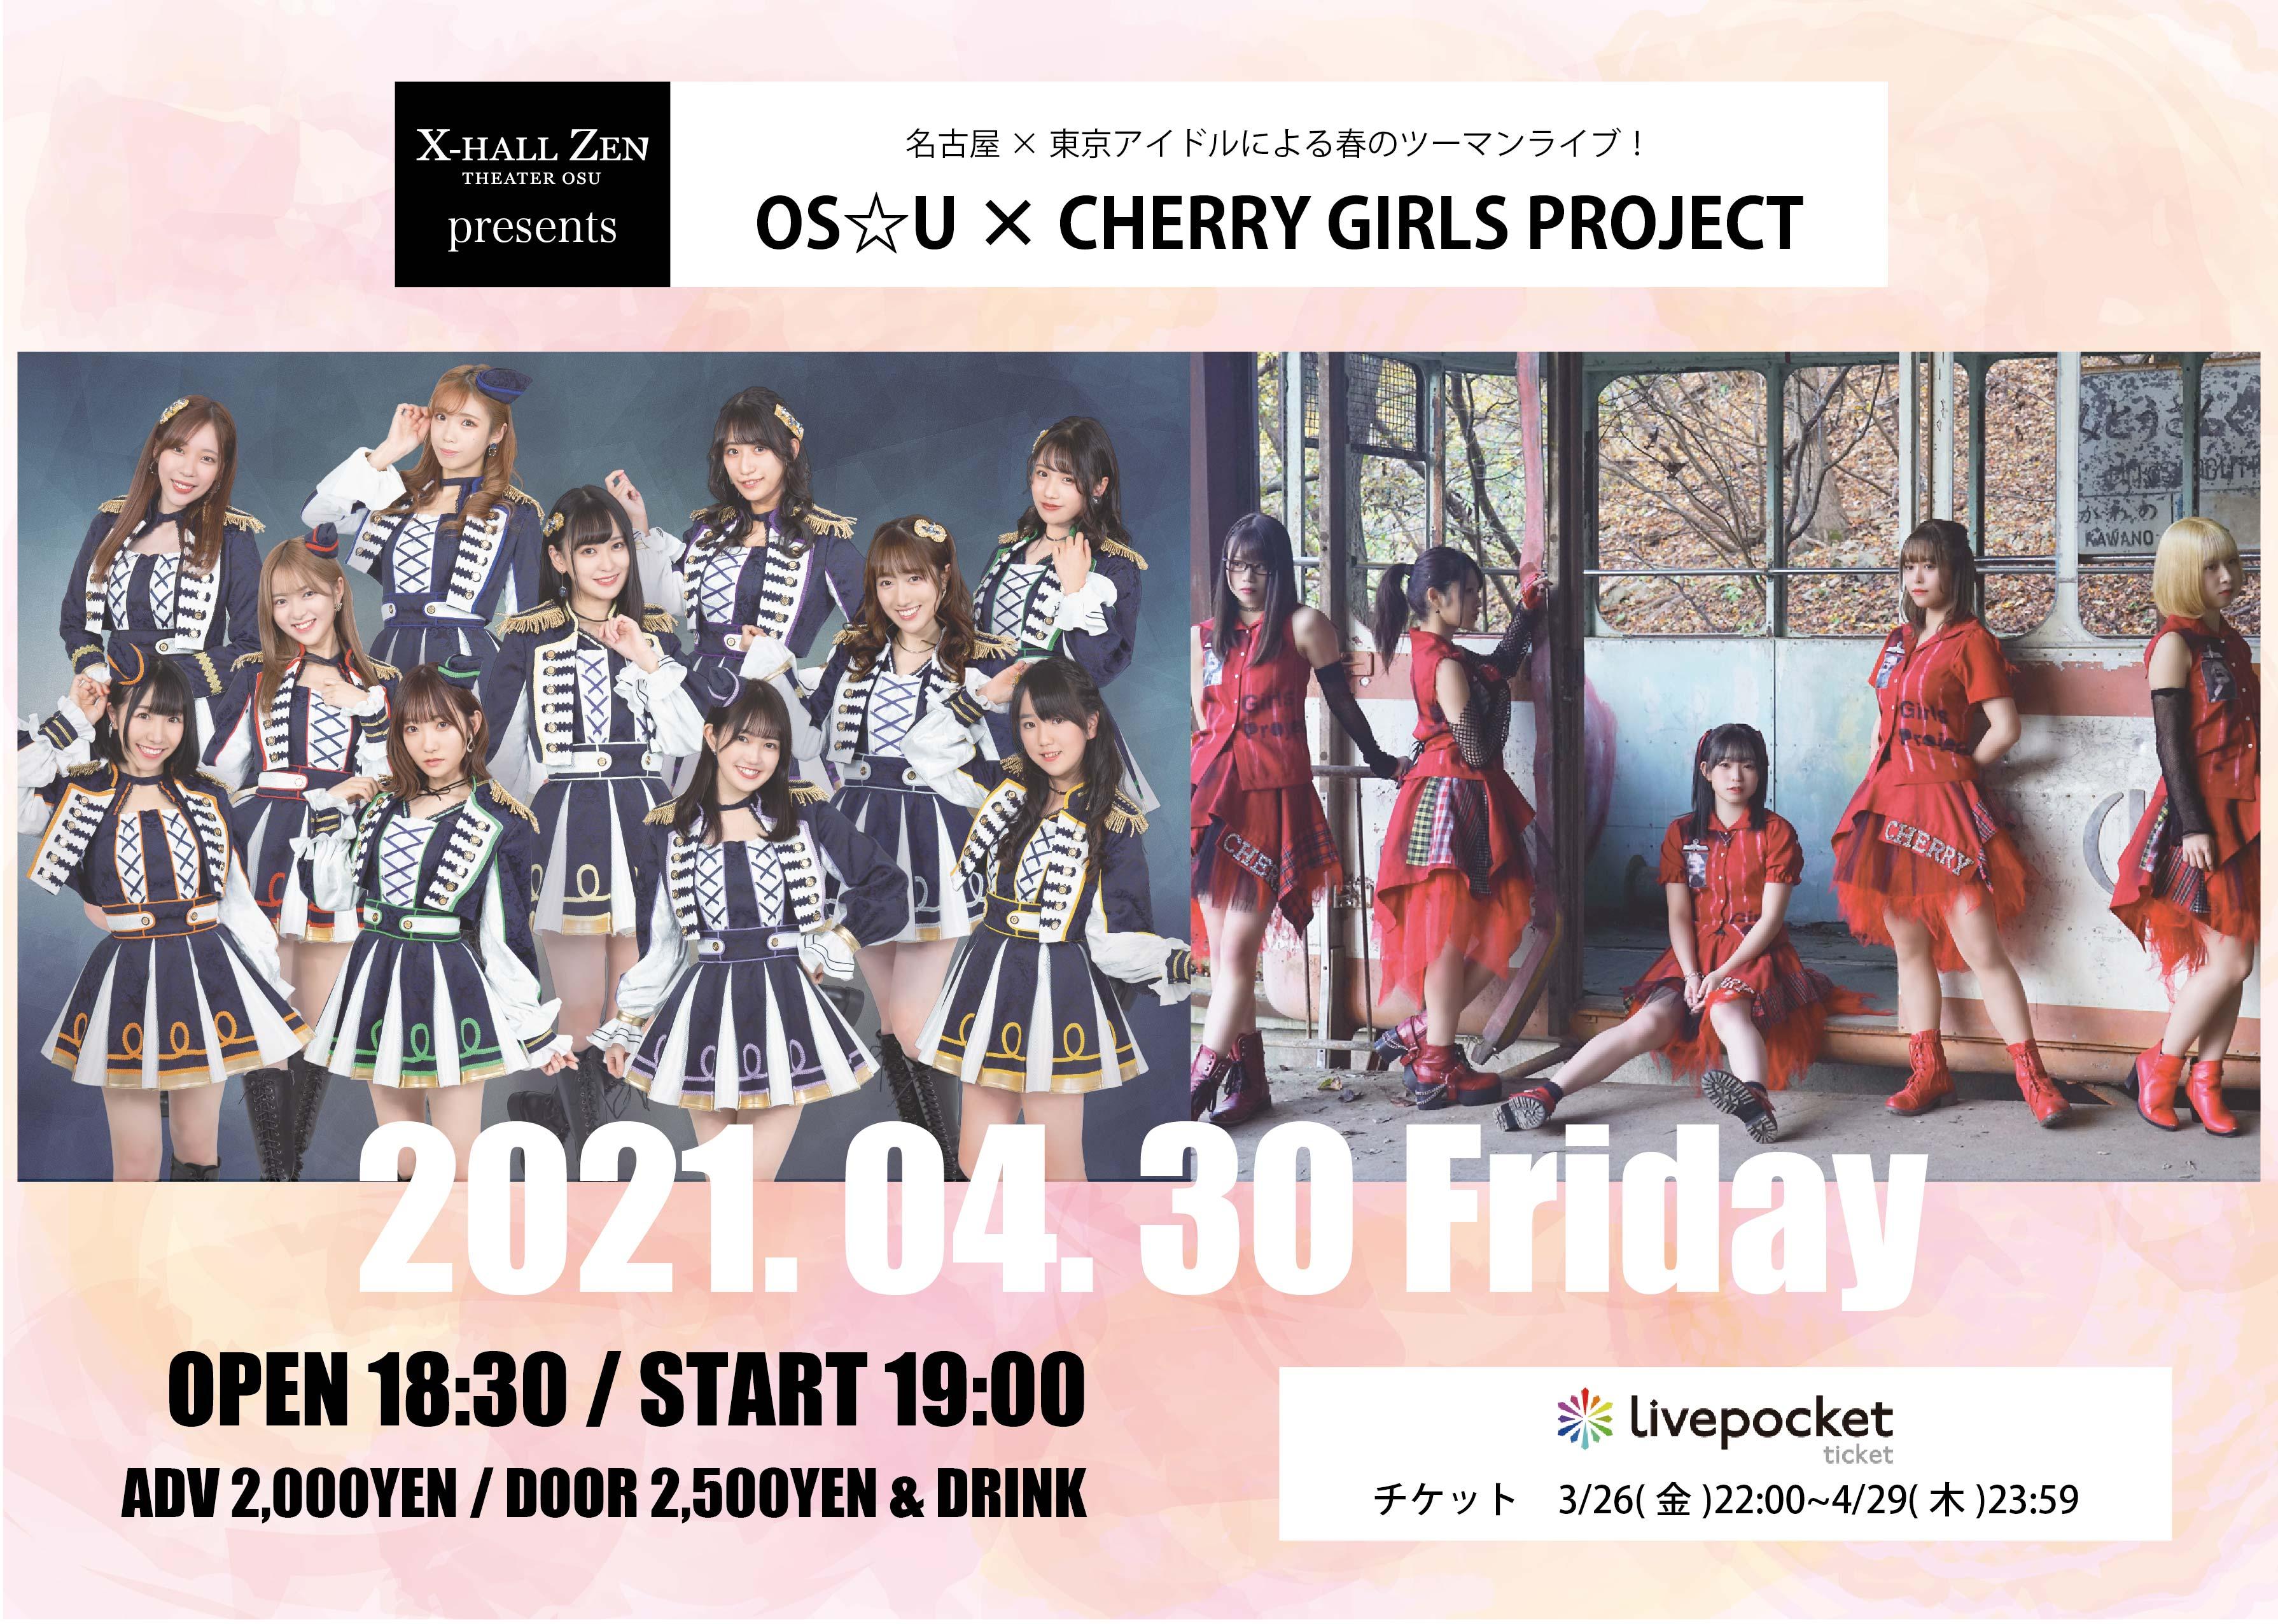 『OS☆U × CHERRY GIRLS PROJECT』  名古屋×東京アイドルによる春のツーマンライブ!